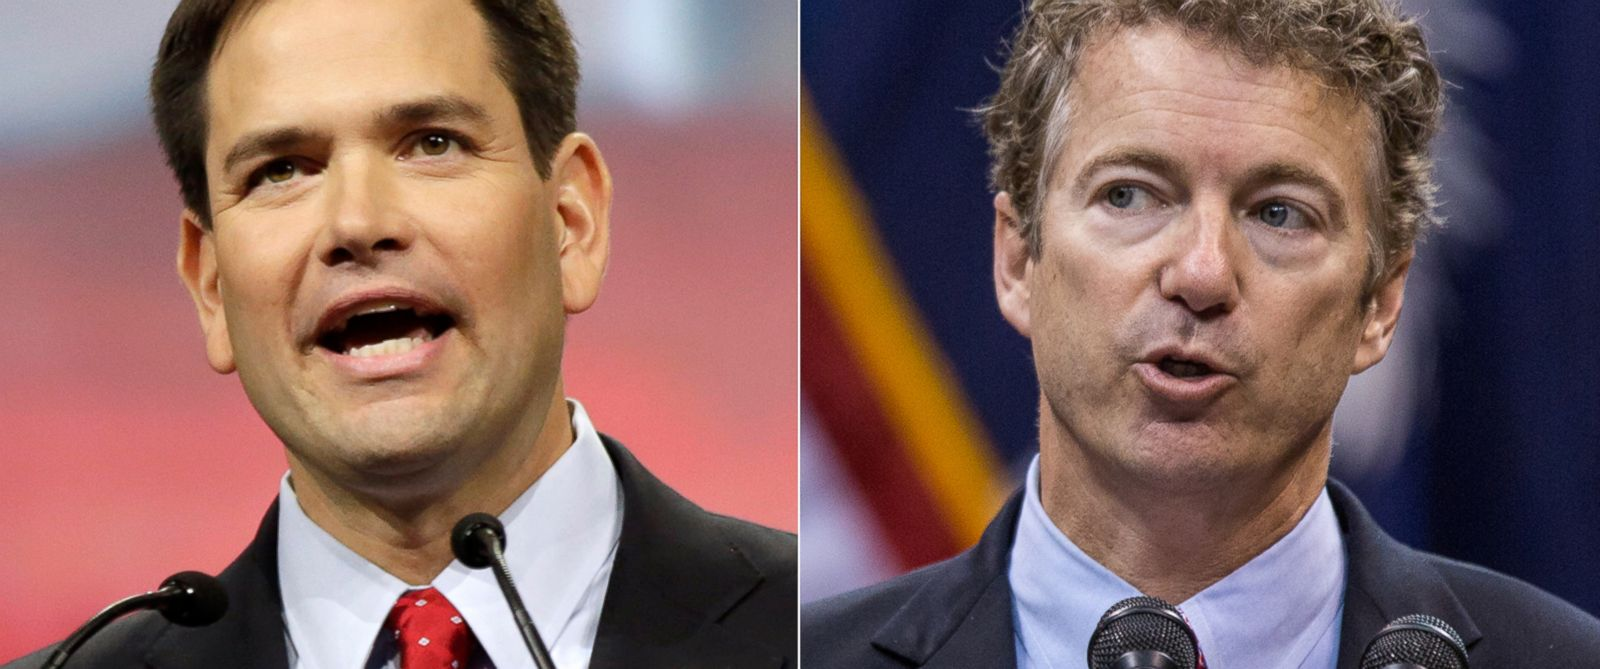 PHOTO: Florida Senator Marco Rubio in Indianapolis, April 25, 2014. | Kentucky Senator Rand Paul in Charleston, S.C., Nov. 12, 2013.